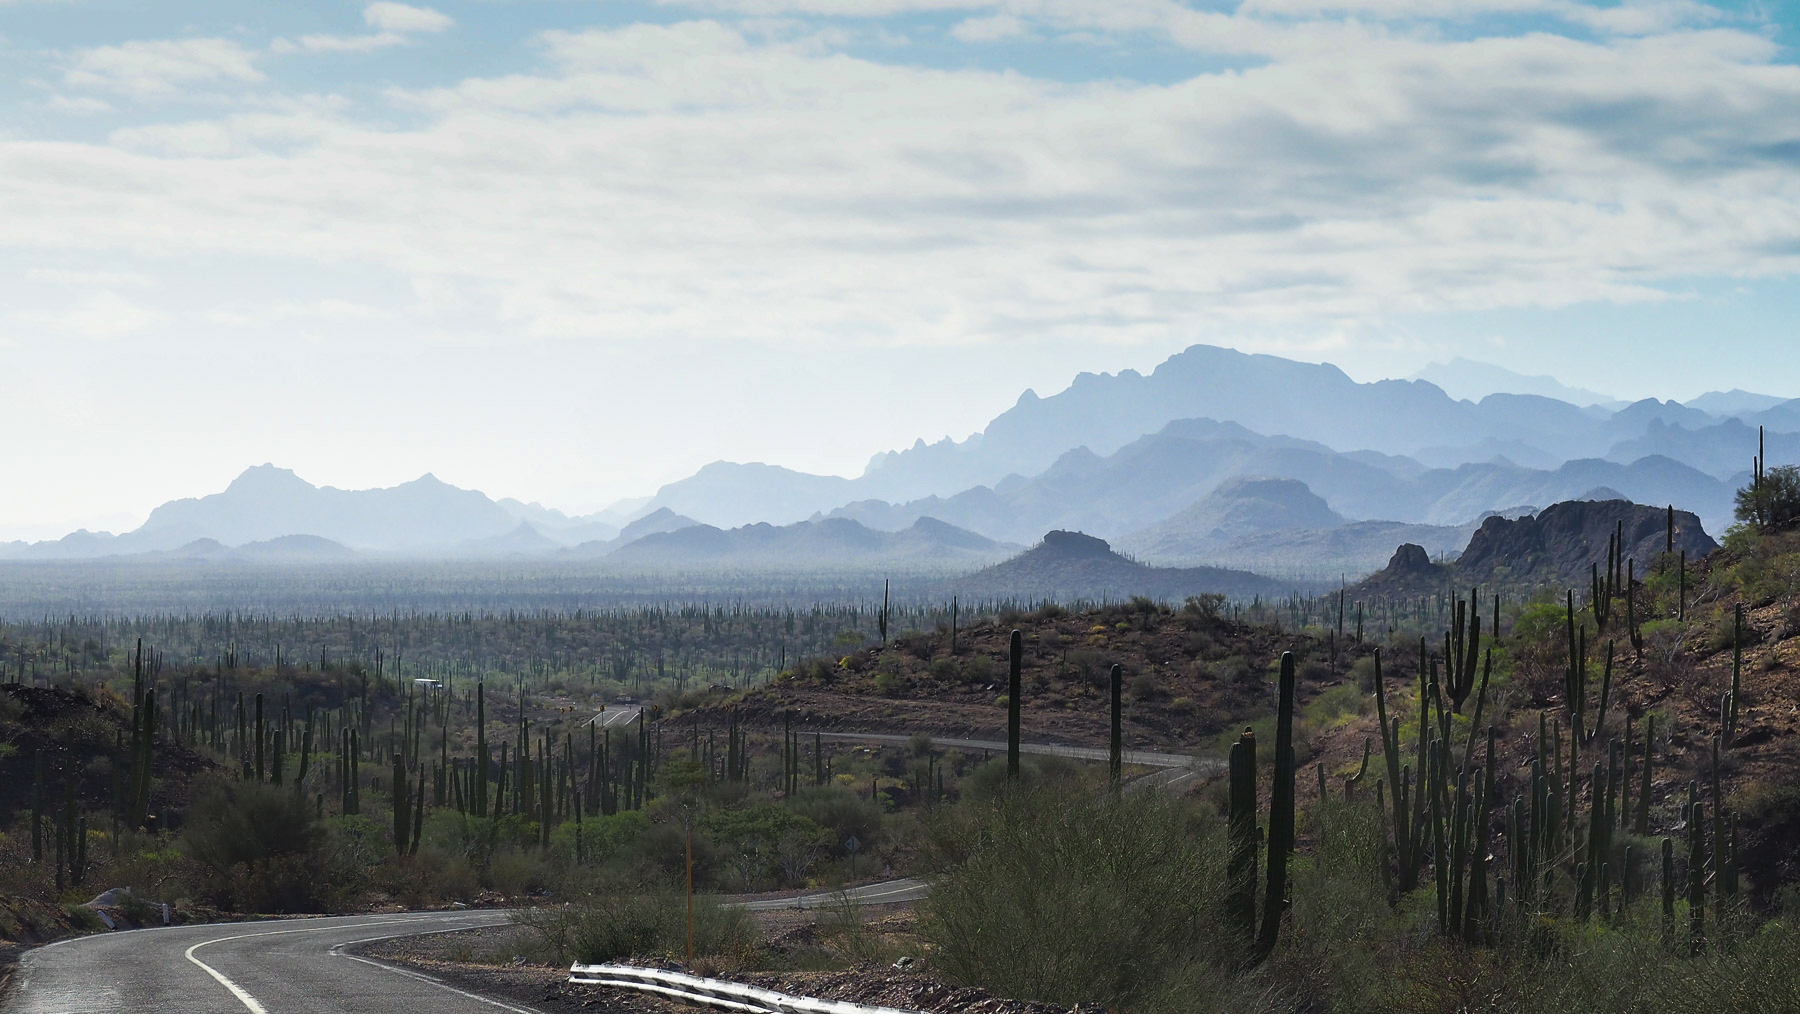 Baja Landschaft im Landesinnern